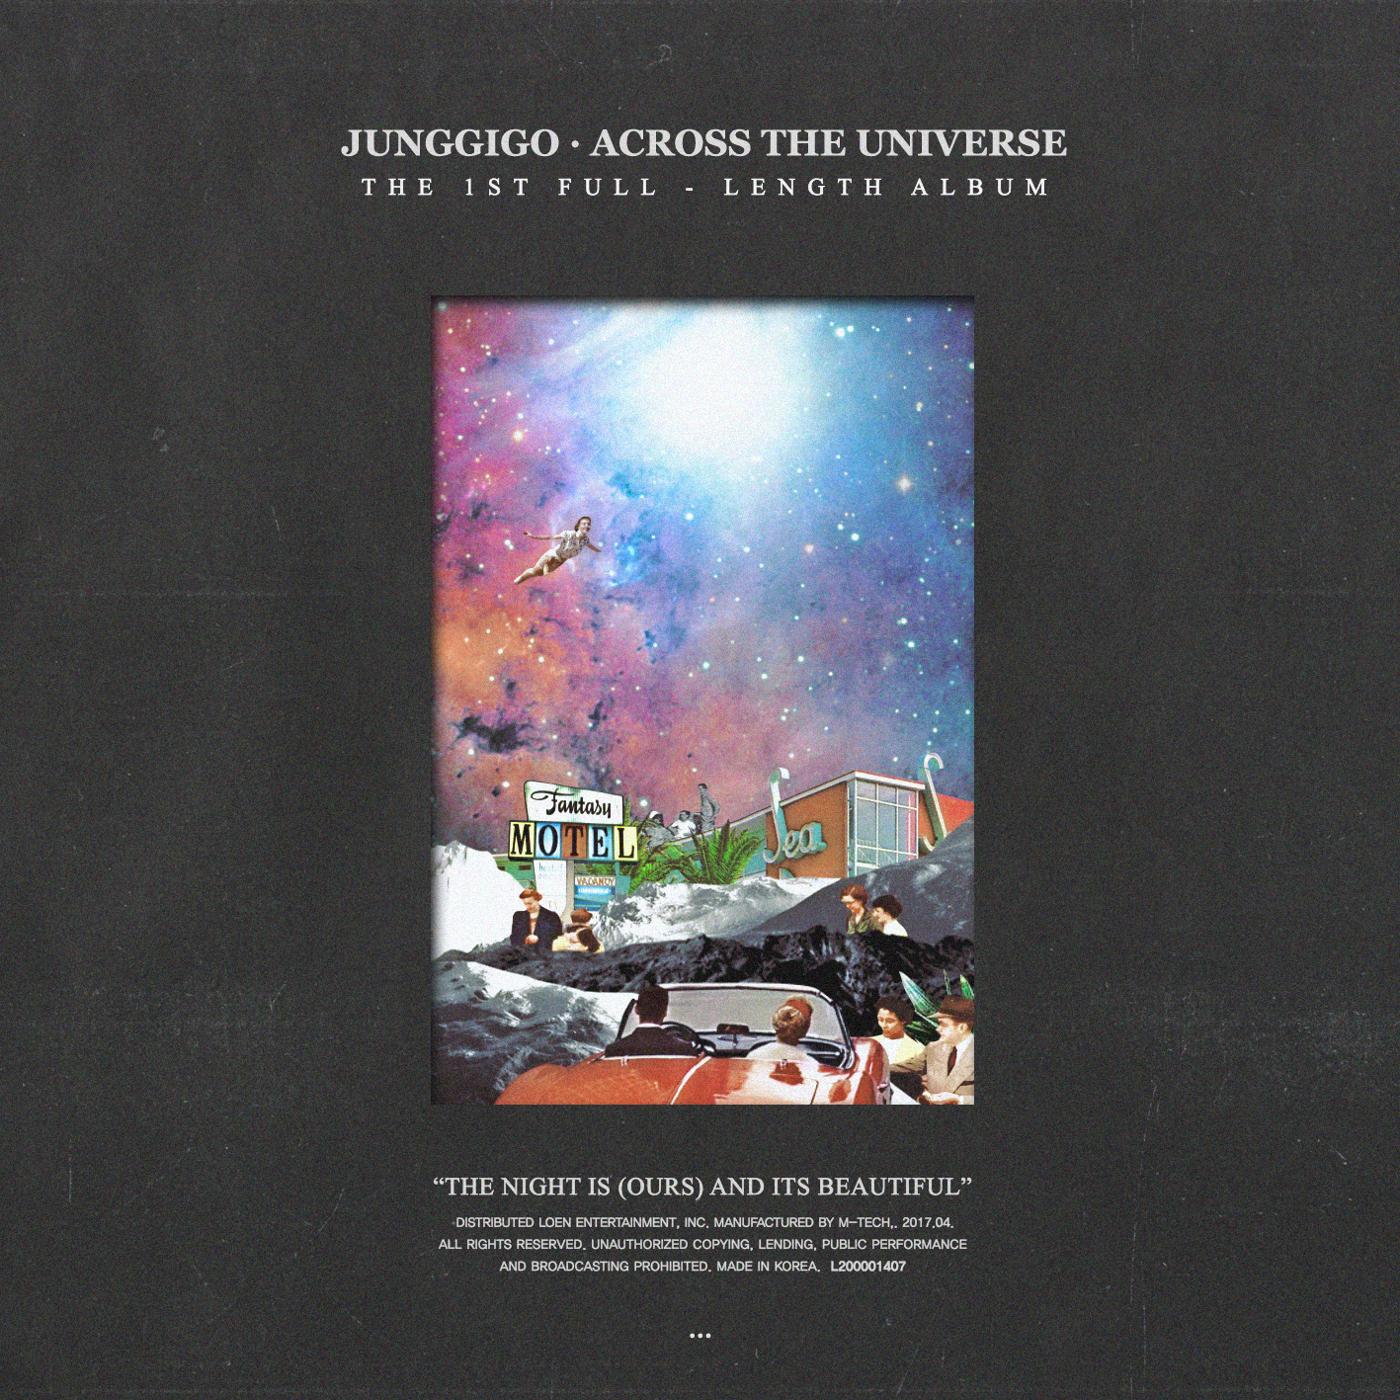 Across The Universe (Junggigo)